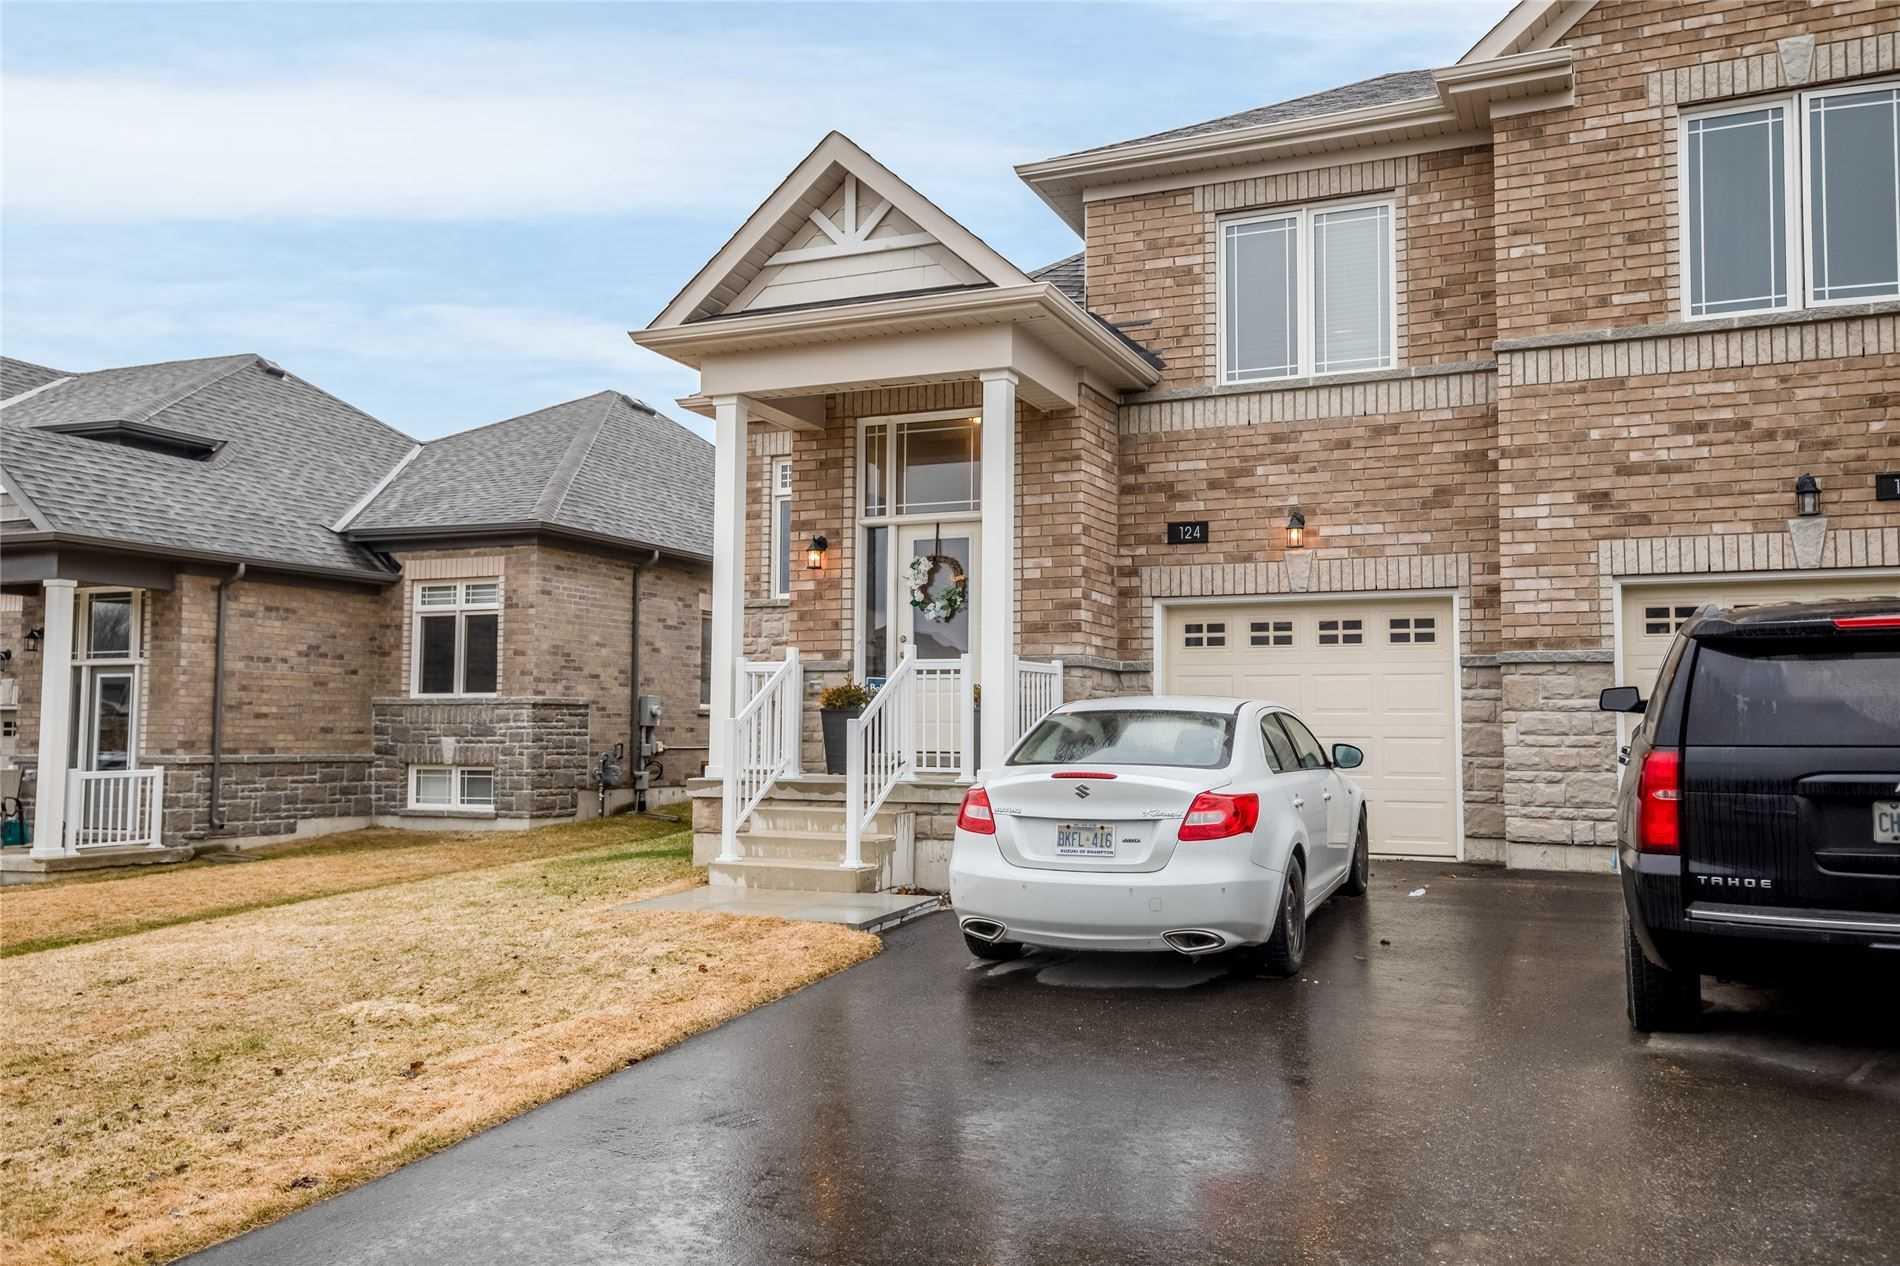 124 Isabella Dr, Orillia, Ontario L3V 8K7, 3 Bedrooms Bedrooms, ,2 BathroomsBathrooms,Att/row/twnhouse,For Sale,Isabella,S5176197